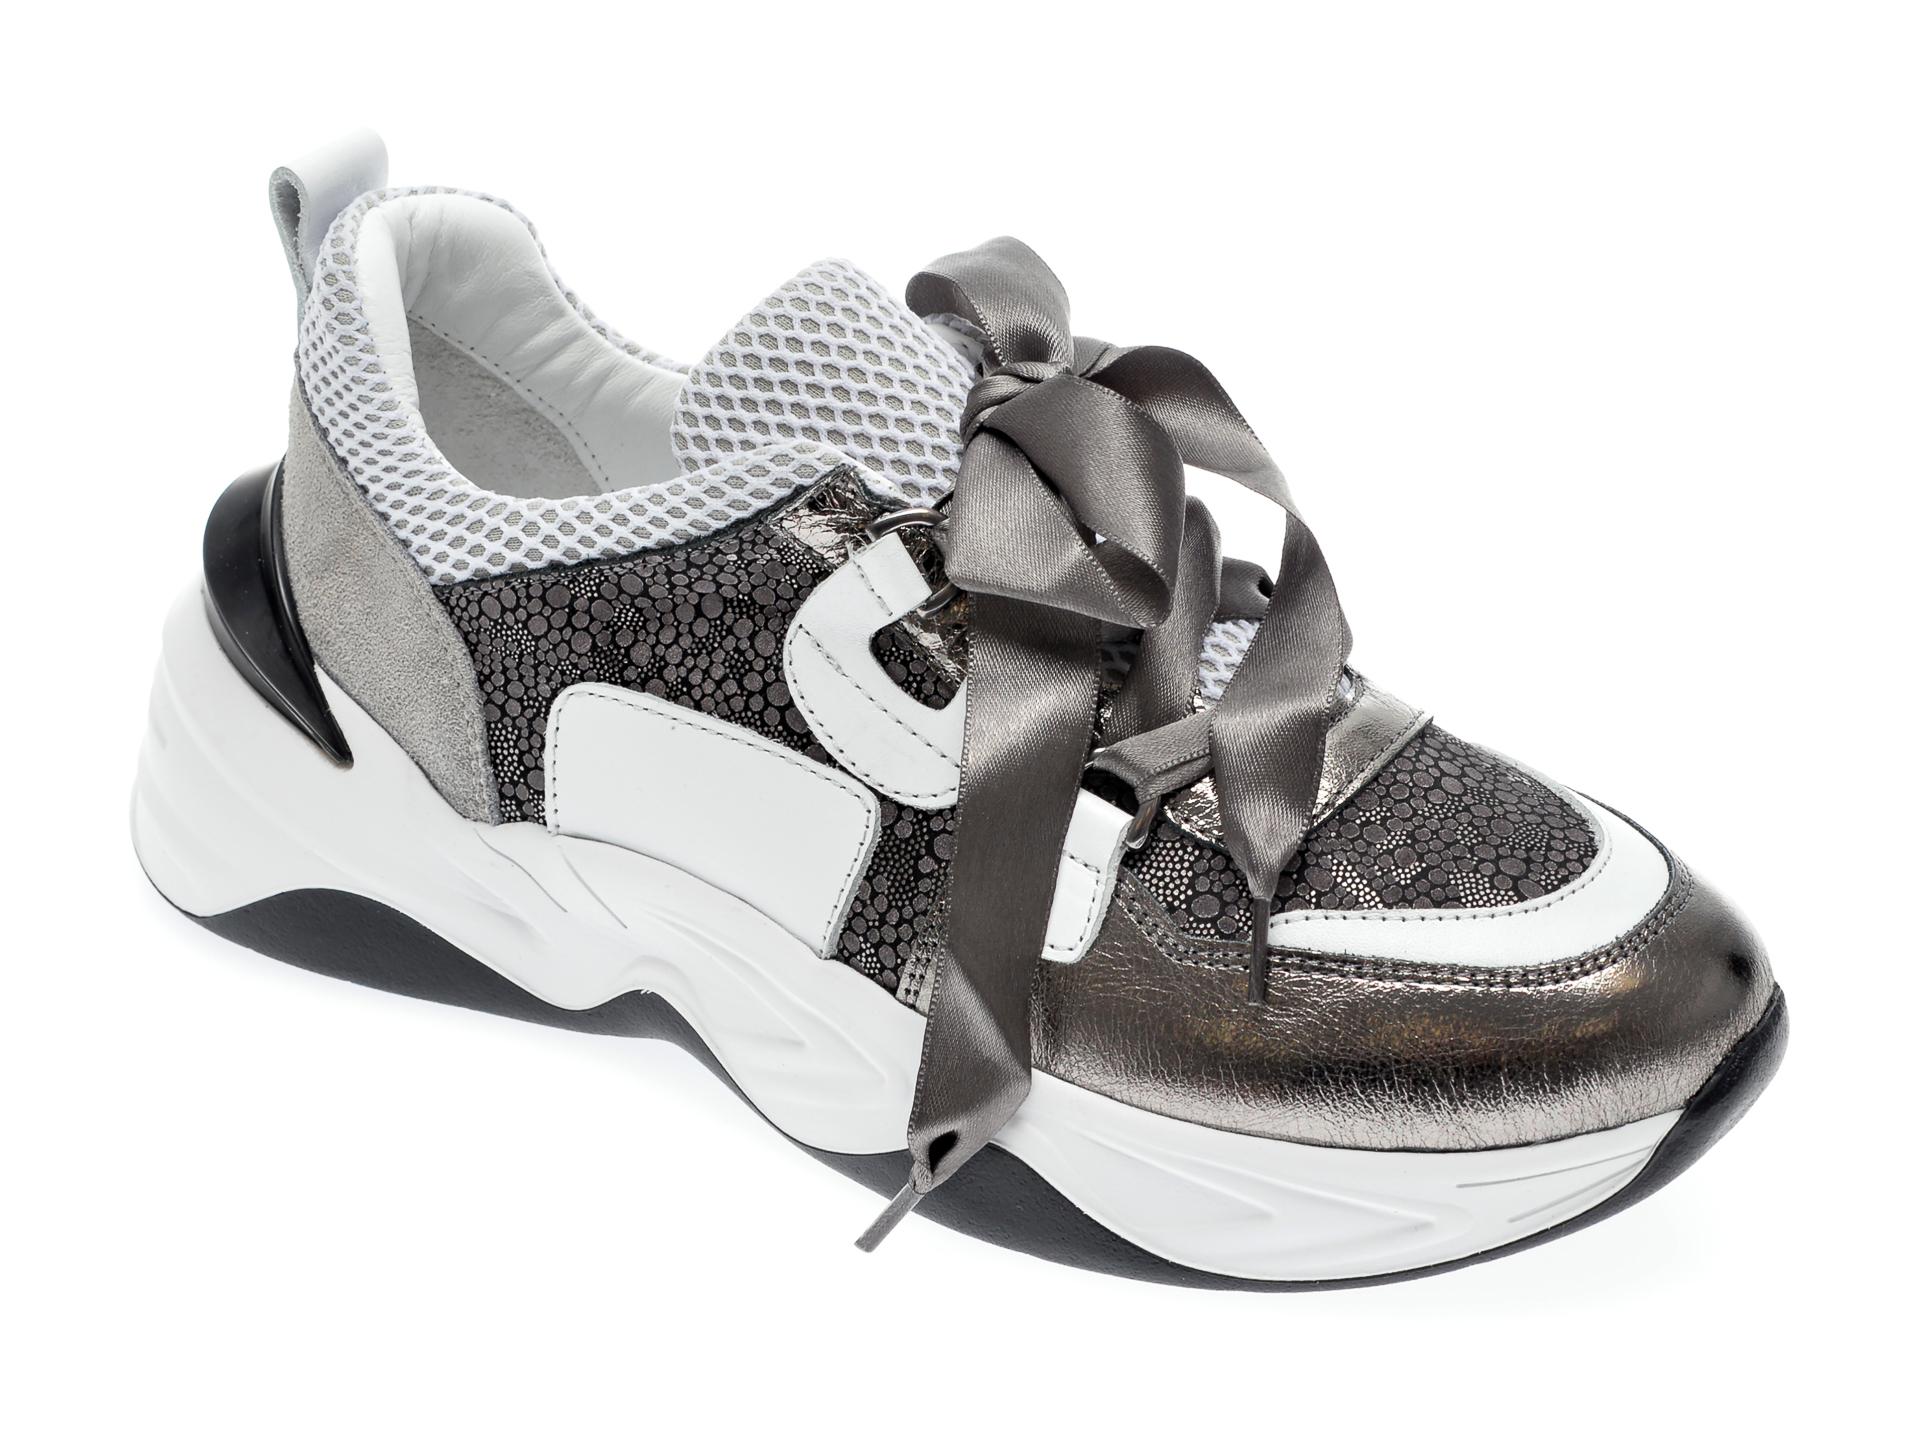 Pantofi sport EPICA argintii, 135P185, din piele naturala si material textil